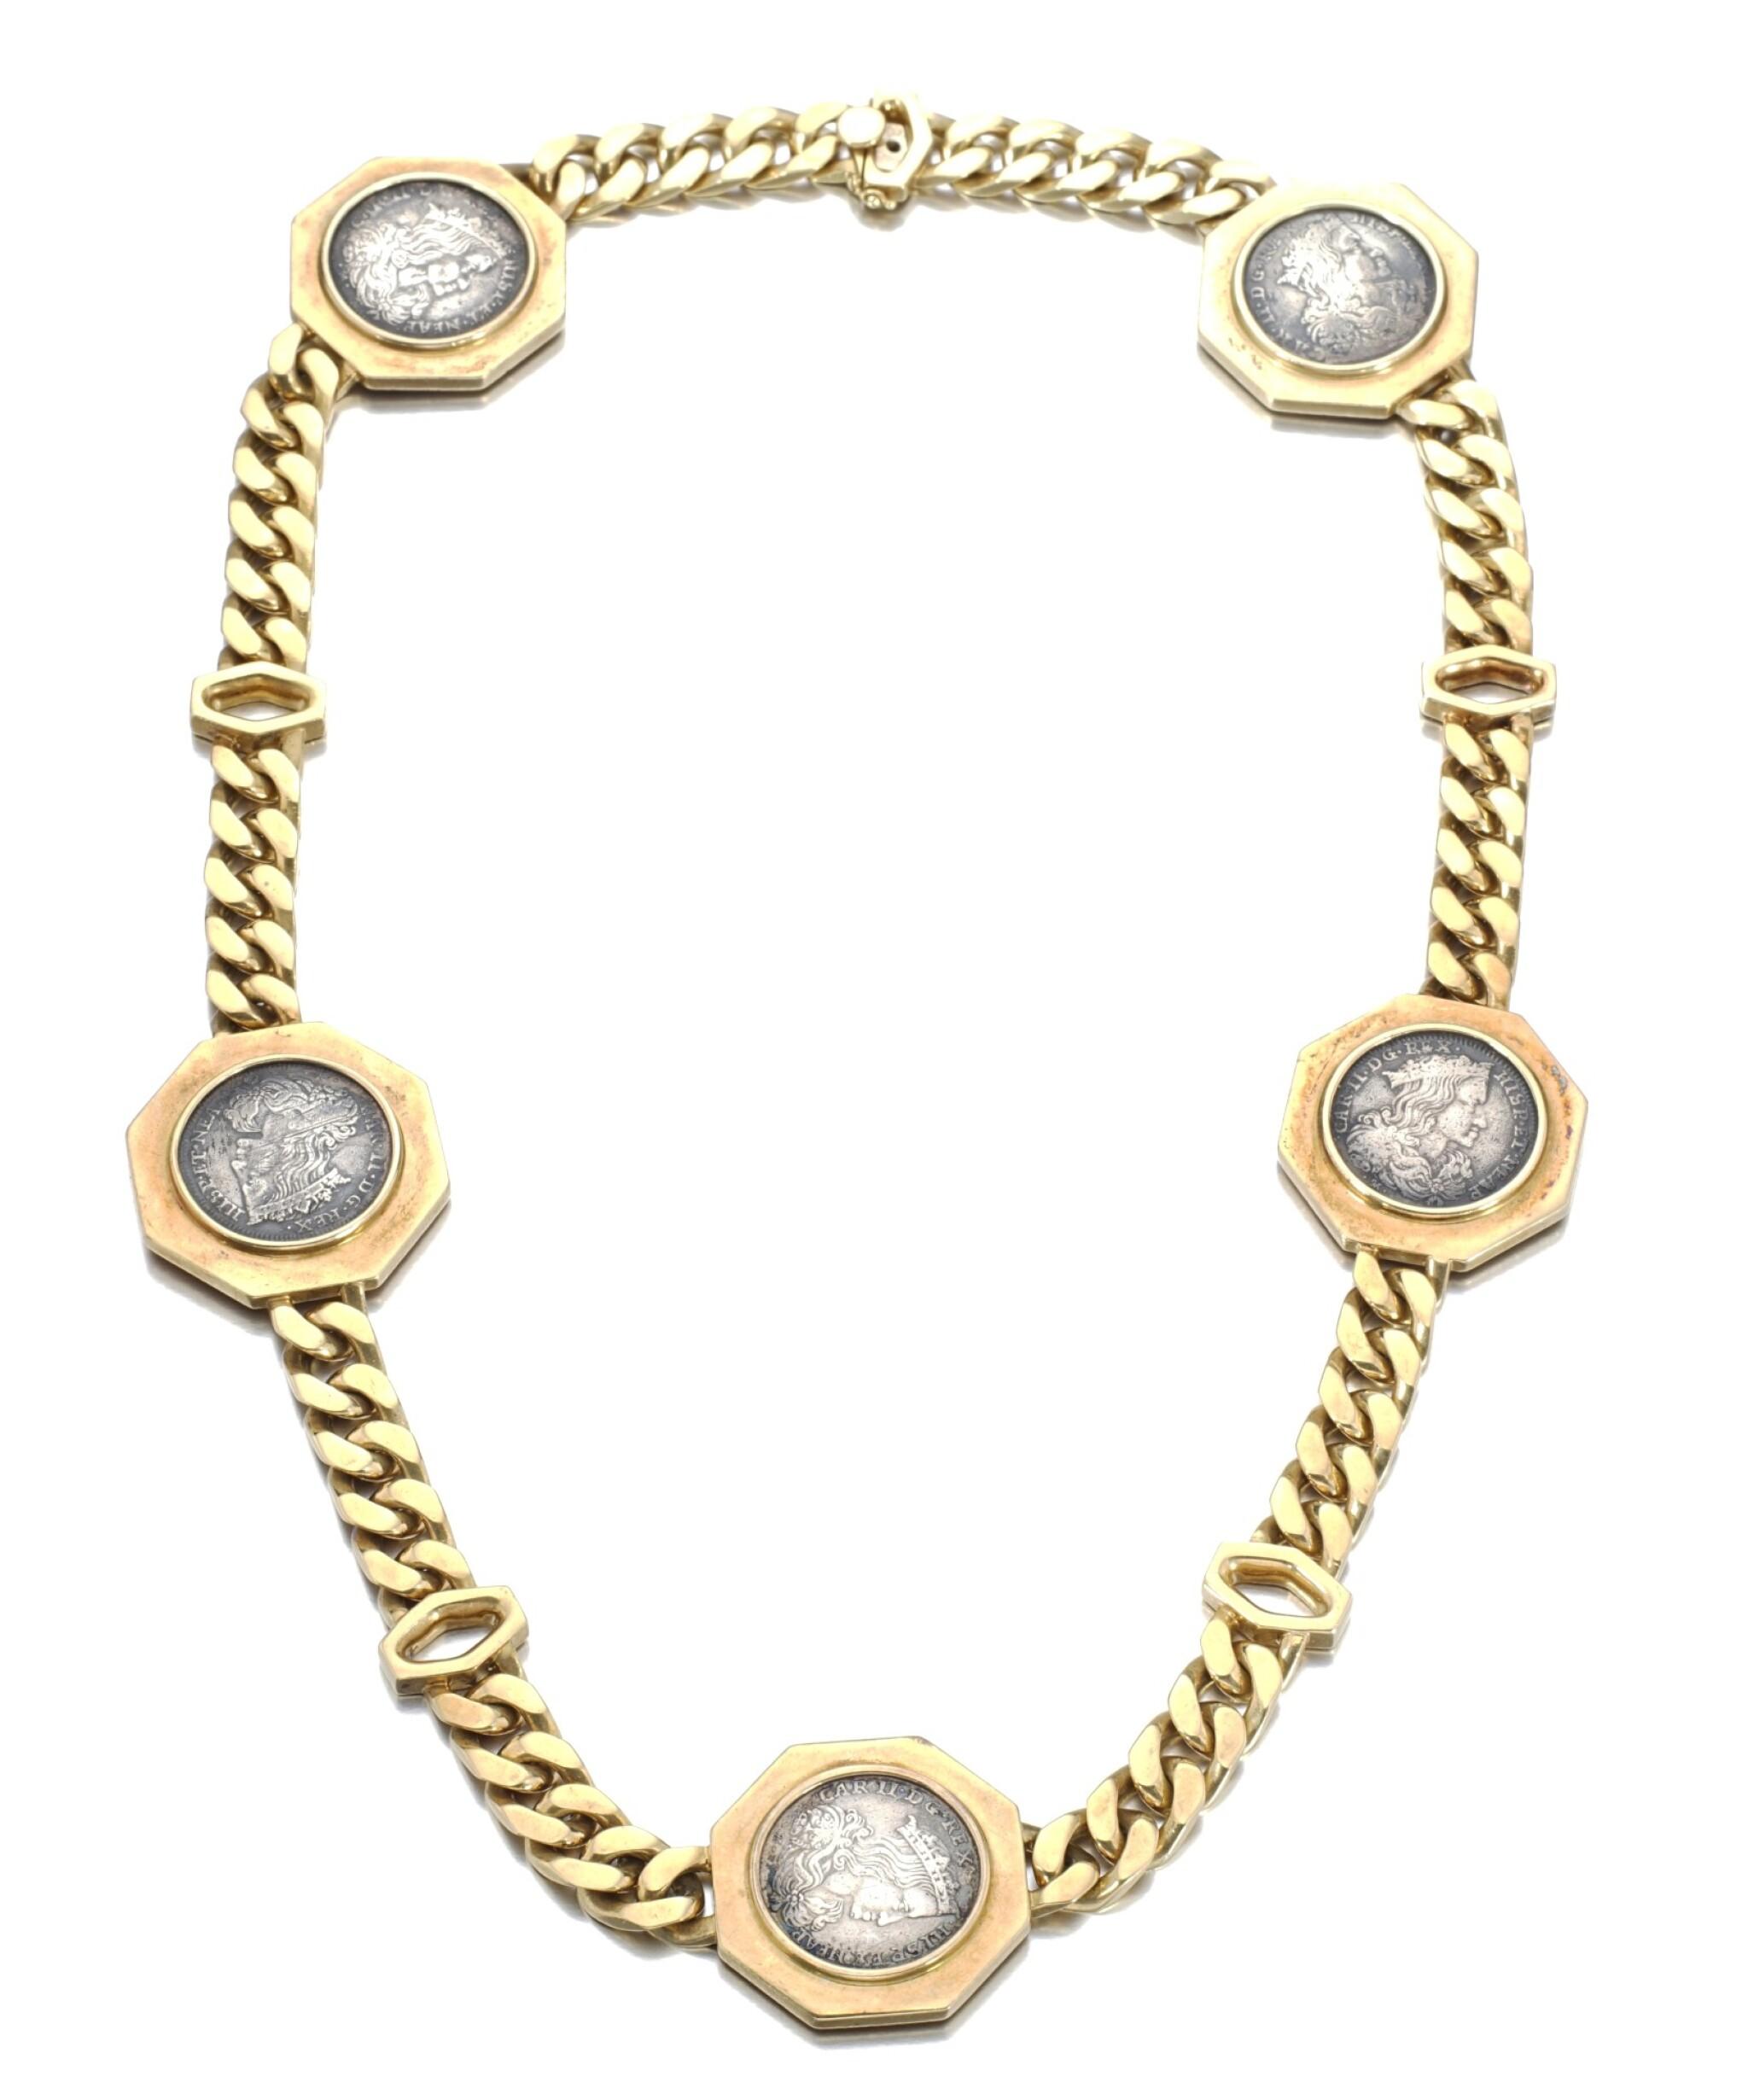 View full screen - View 1 of Lot 696. Bulgari | Gold sautoir, 'Monete', 1970s | 寶格麗 | 黃金「Monete」長項鏈.